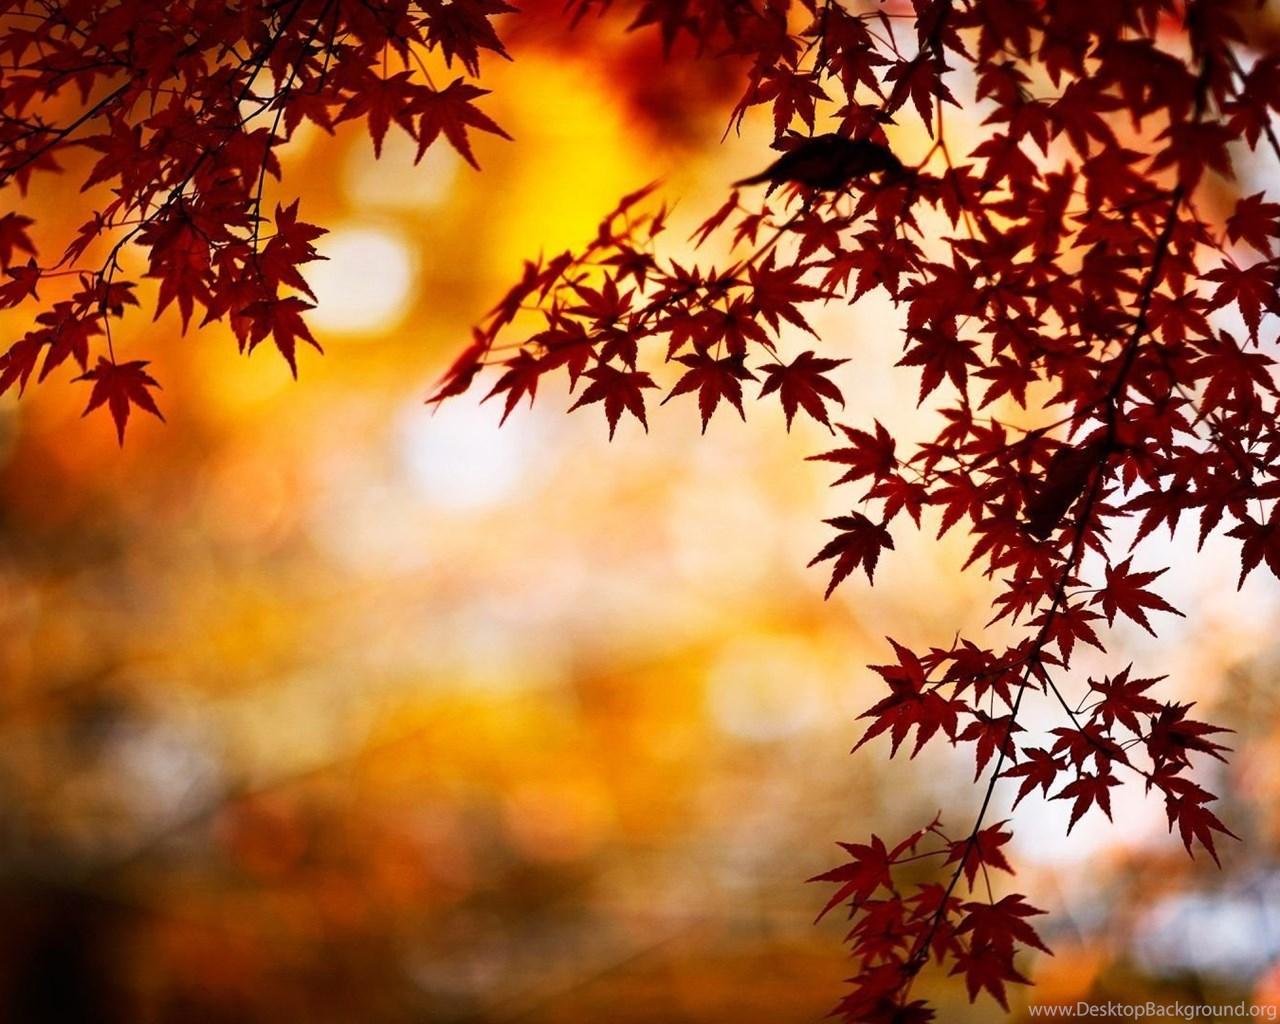 Autumn Season Hd Wallpapers Desktop Background